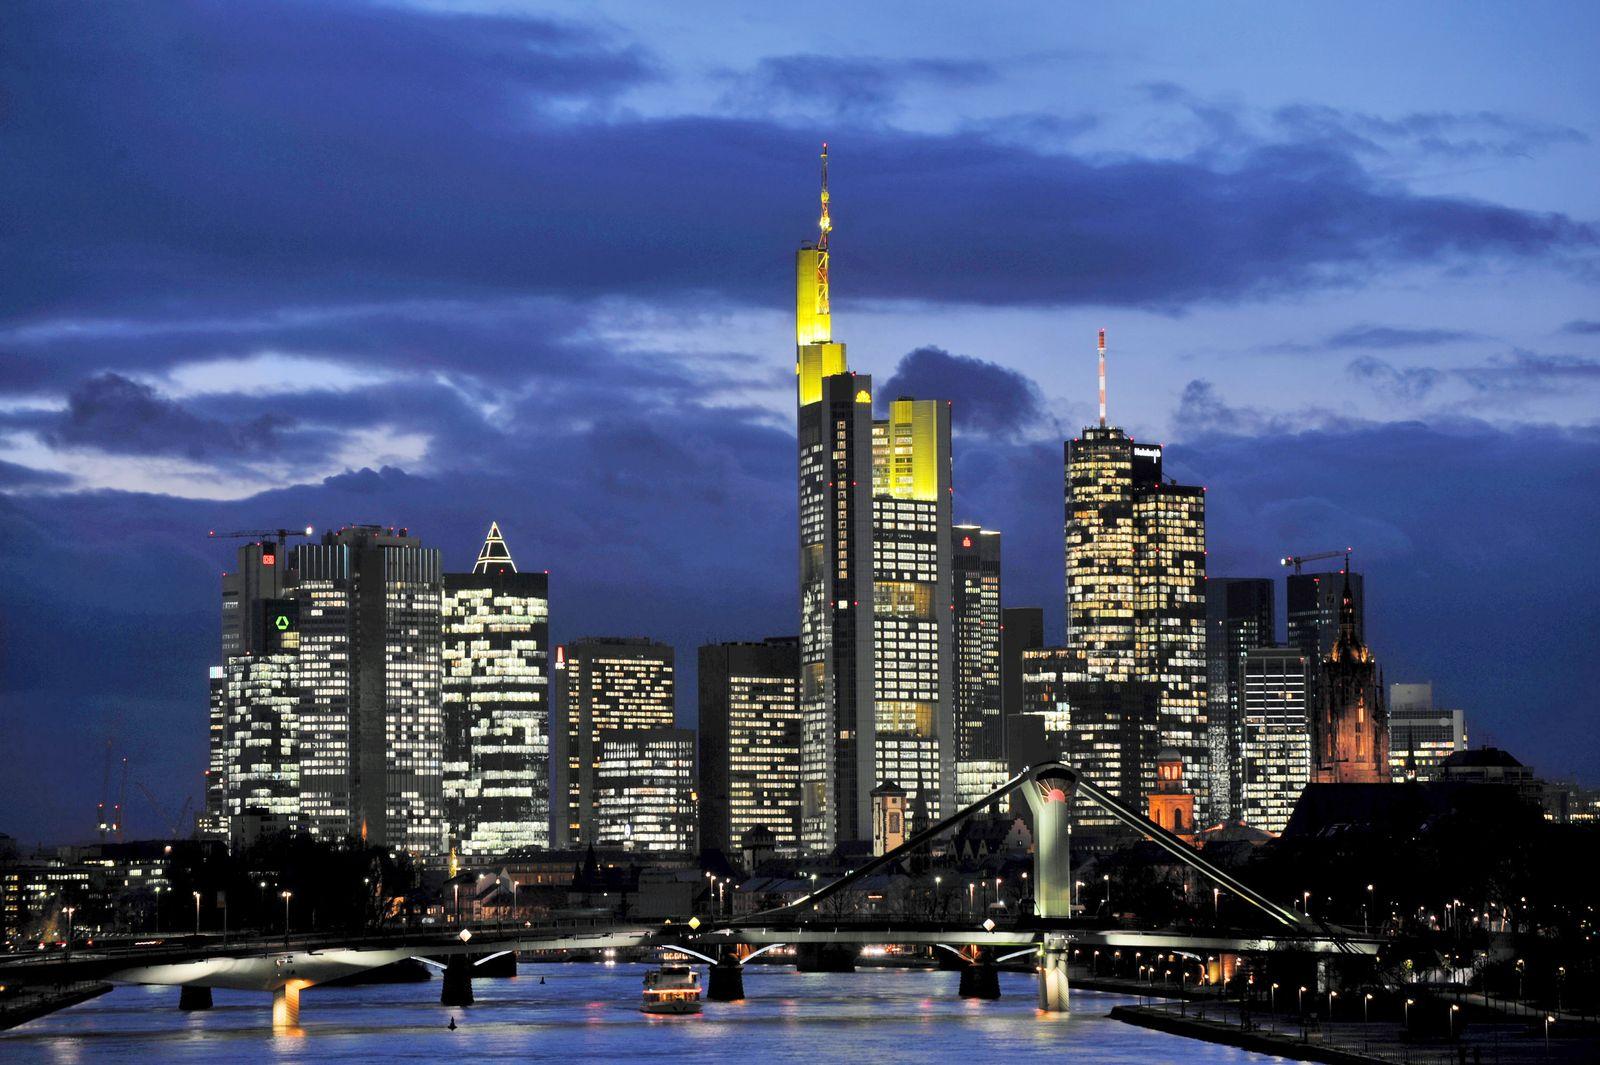 Brüderle / Banken / Frankfurt Bankenviertel / Skyline